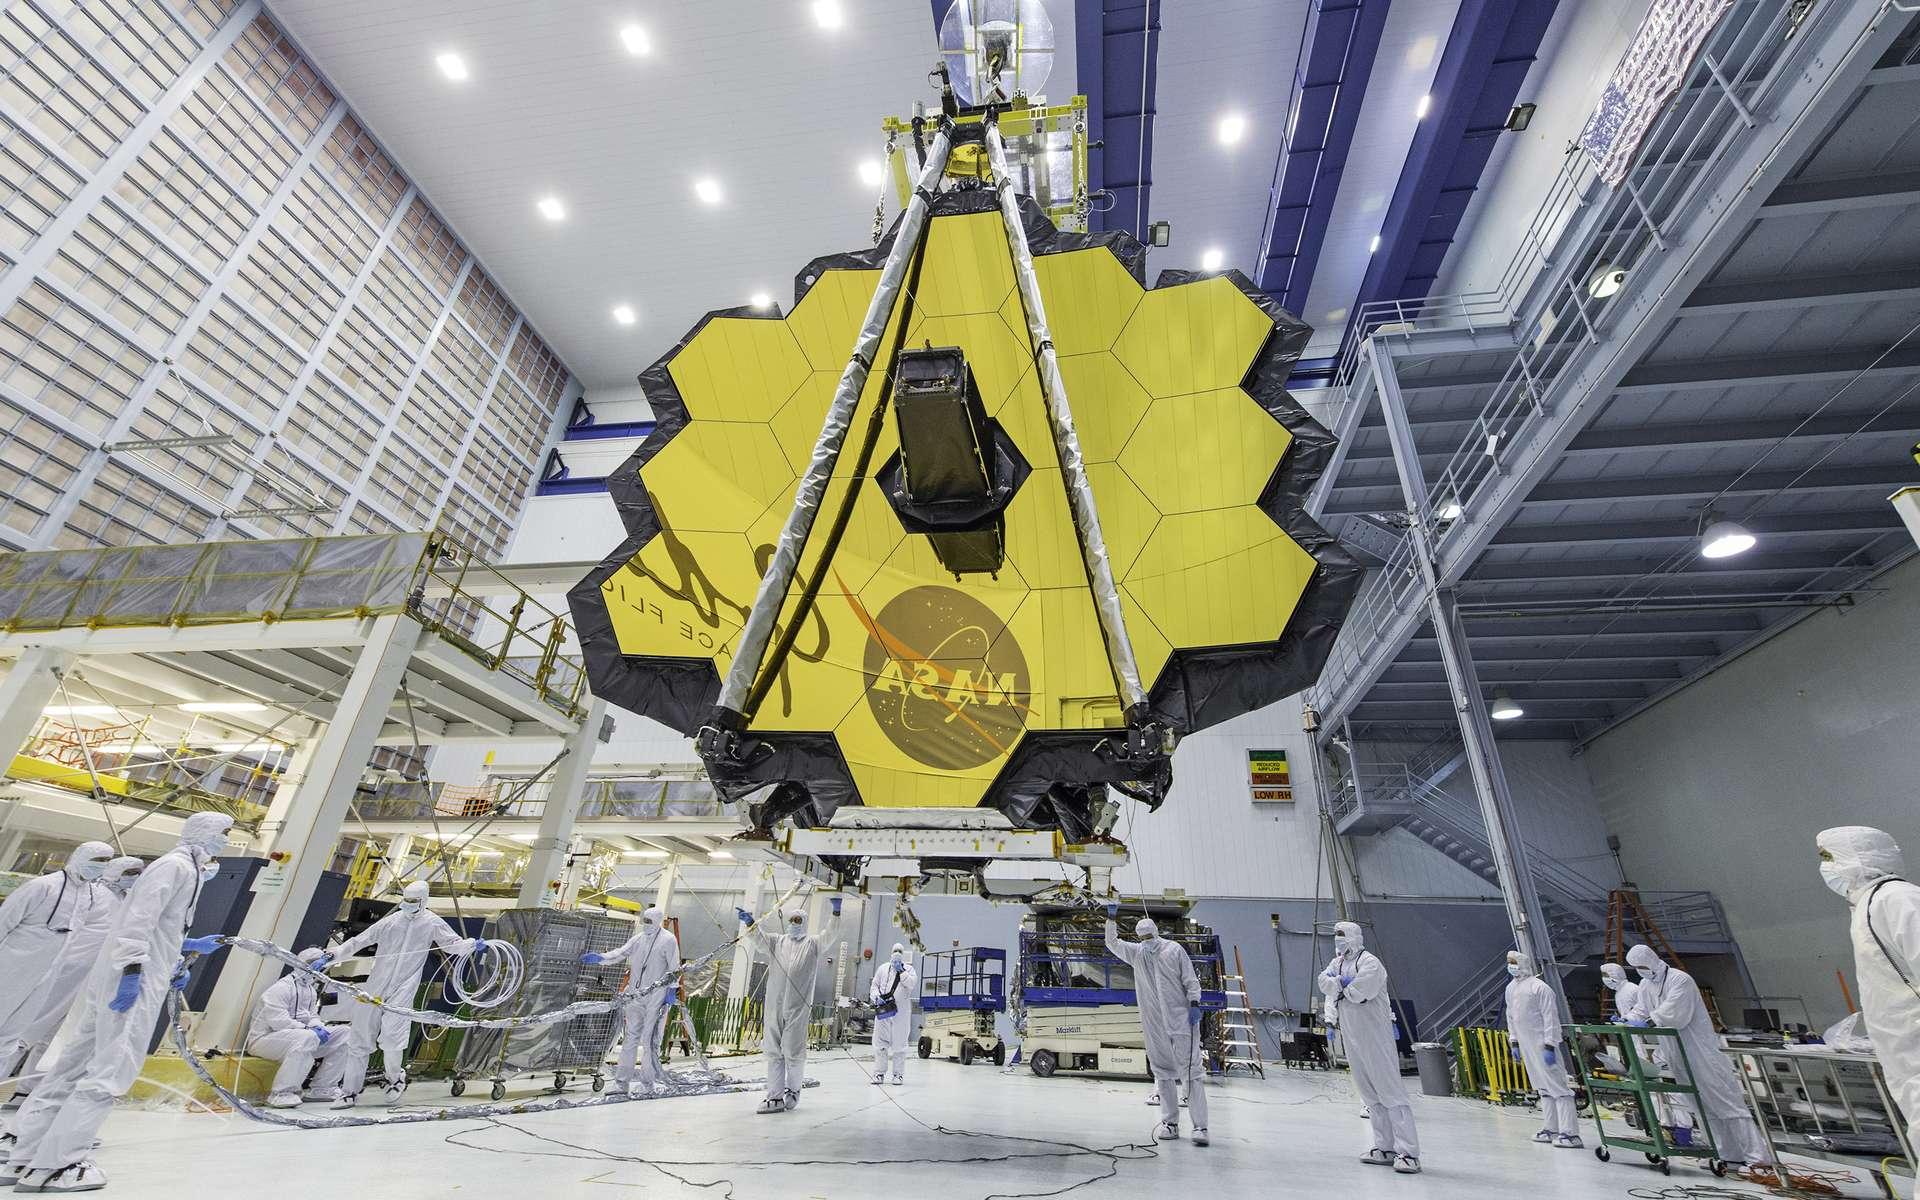 Le miroir du James Webb Space Telescope. © Desiree Stover, Nasa